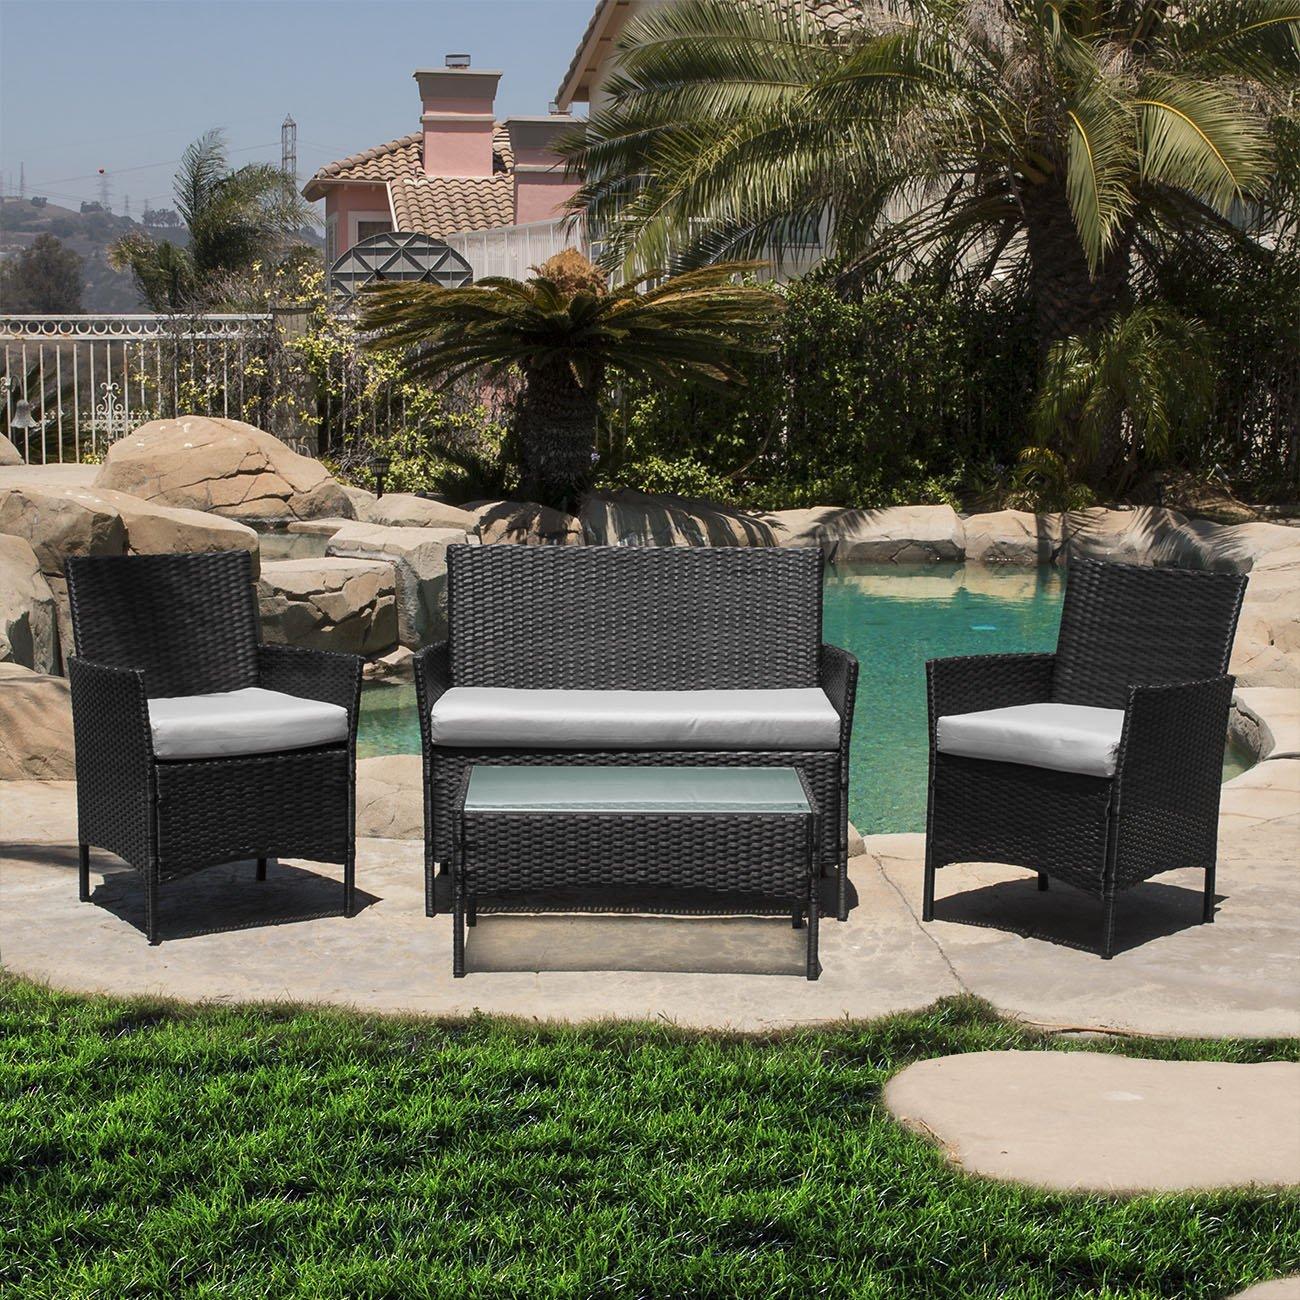 Top 5 Wicker Garden Furniture Picks For Classy Results